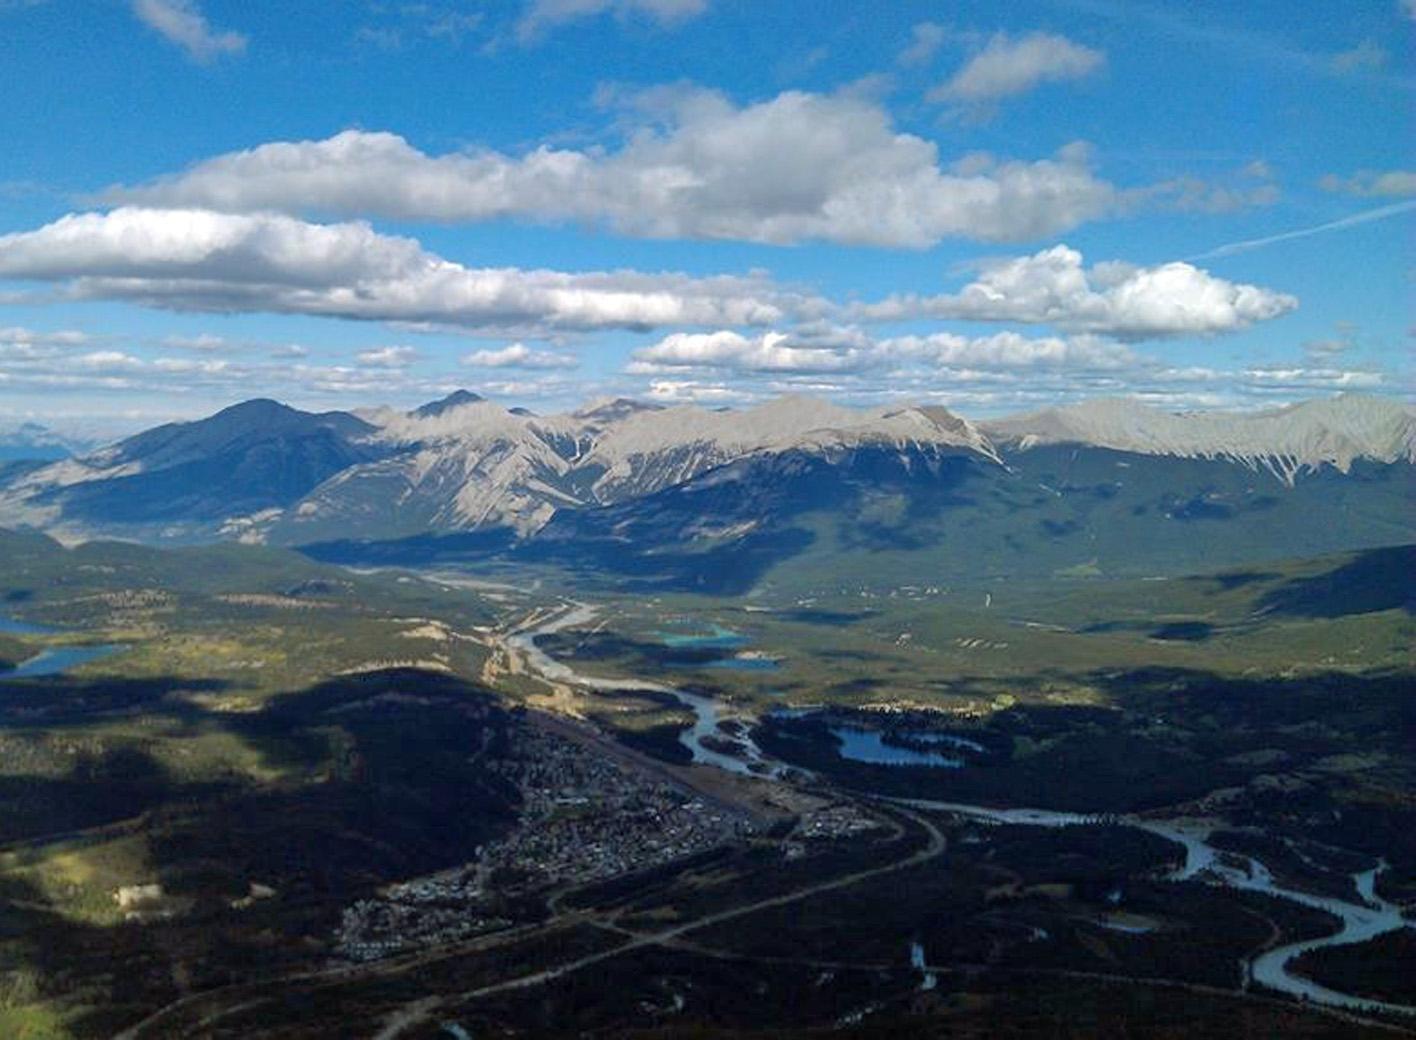 View from Whistlers Peak of Jasper Alberta Canada - MacRo Report Blog